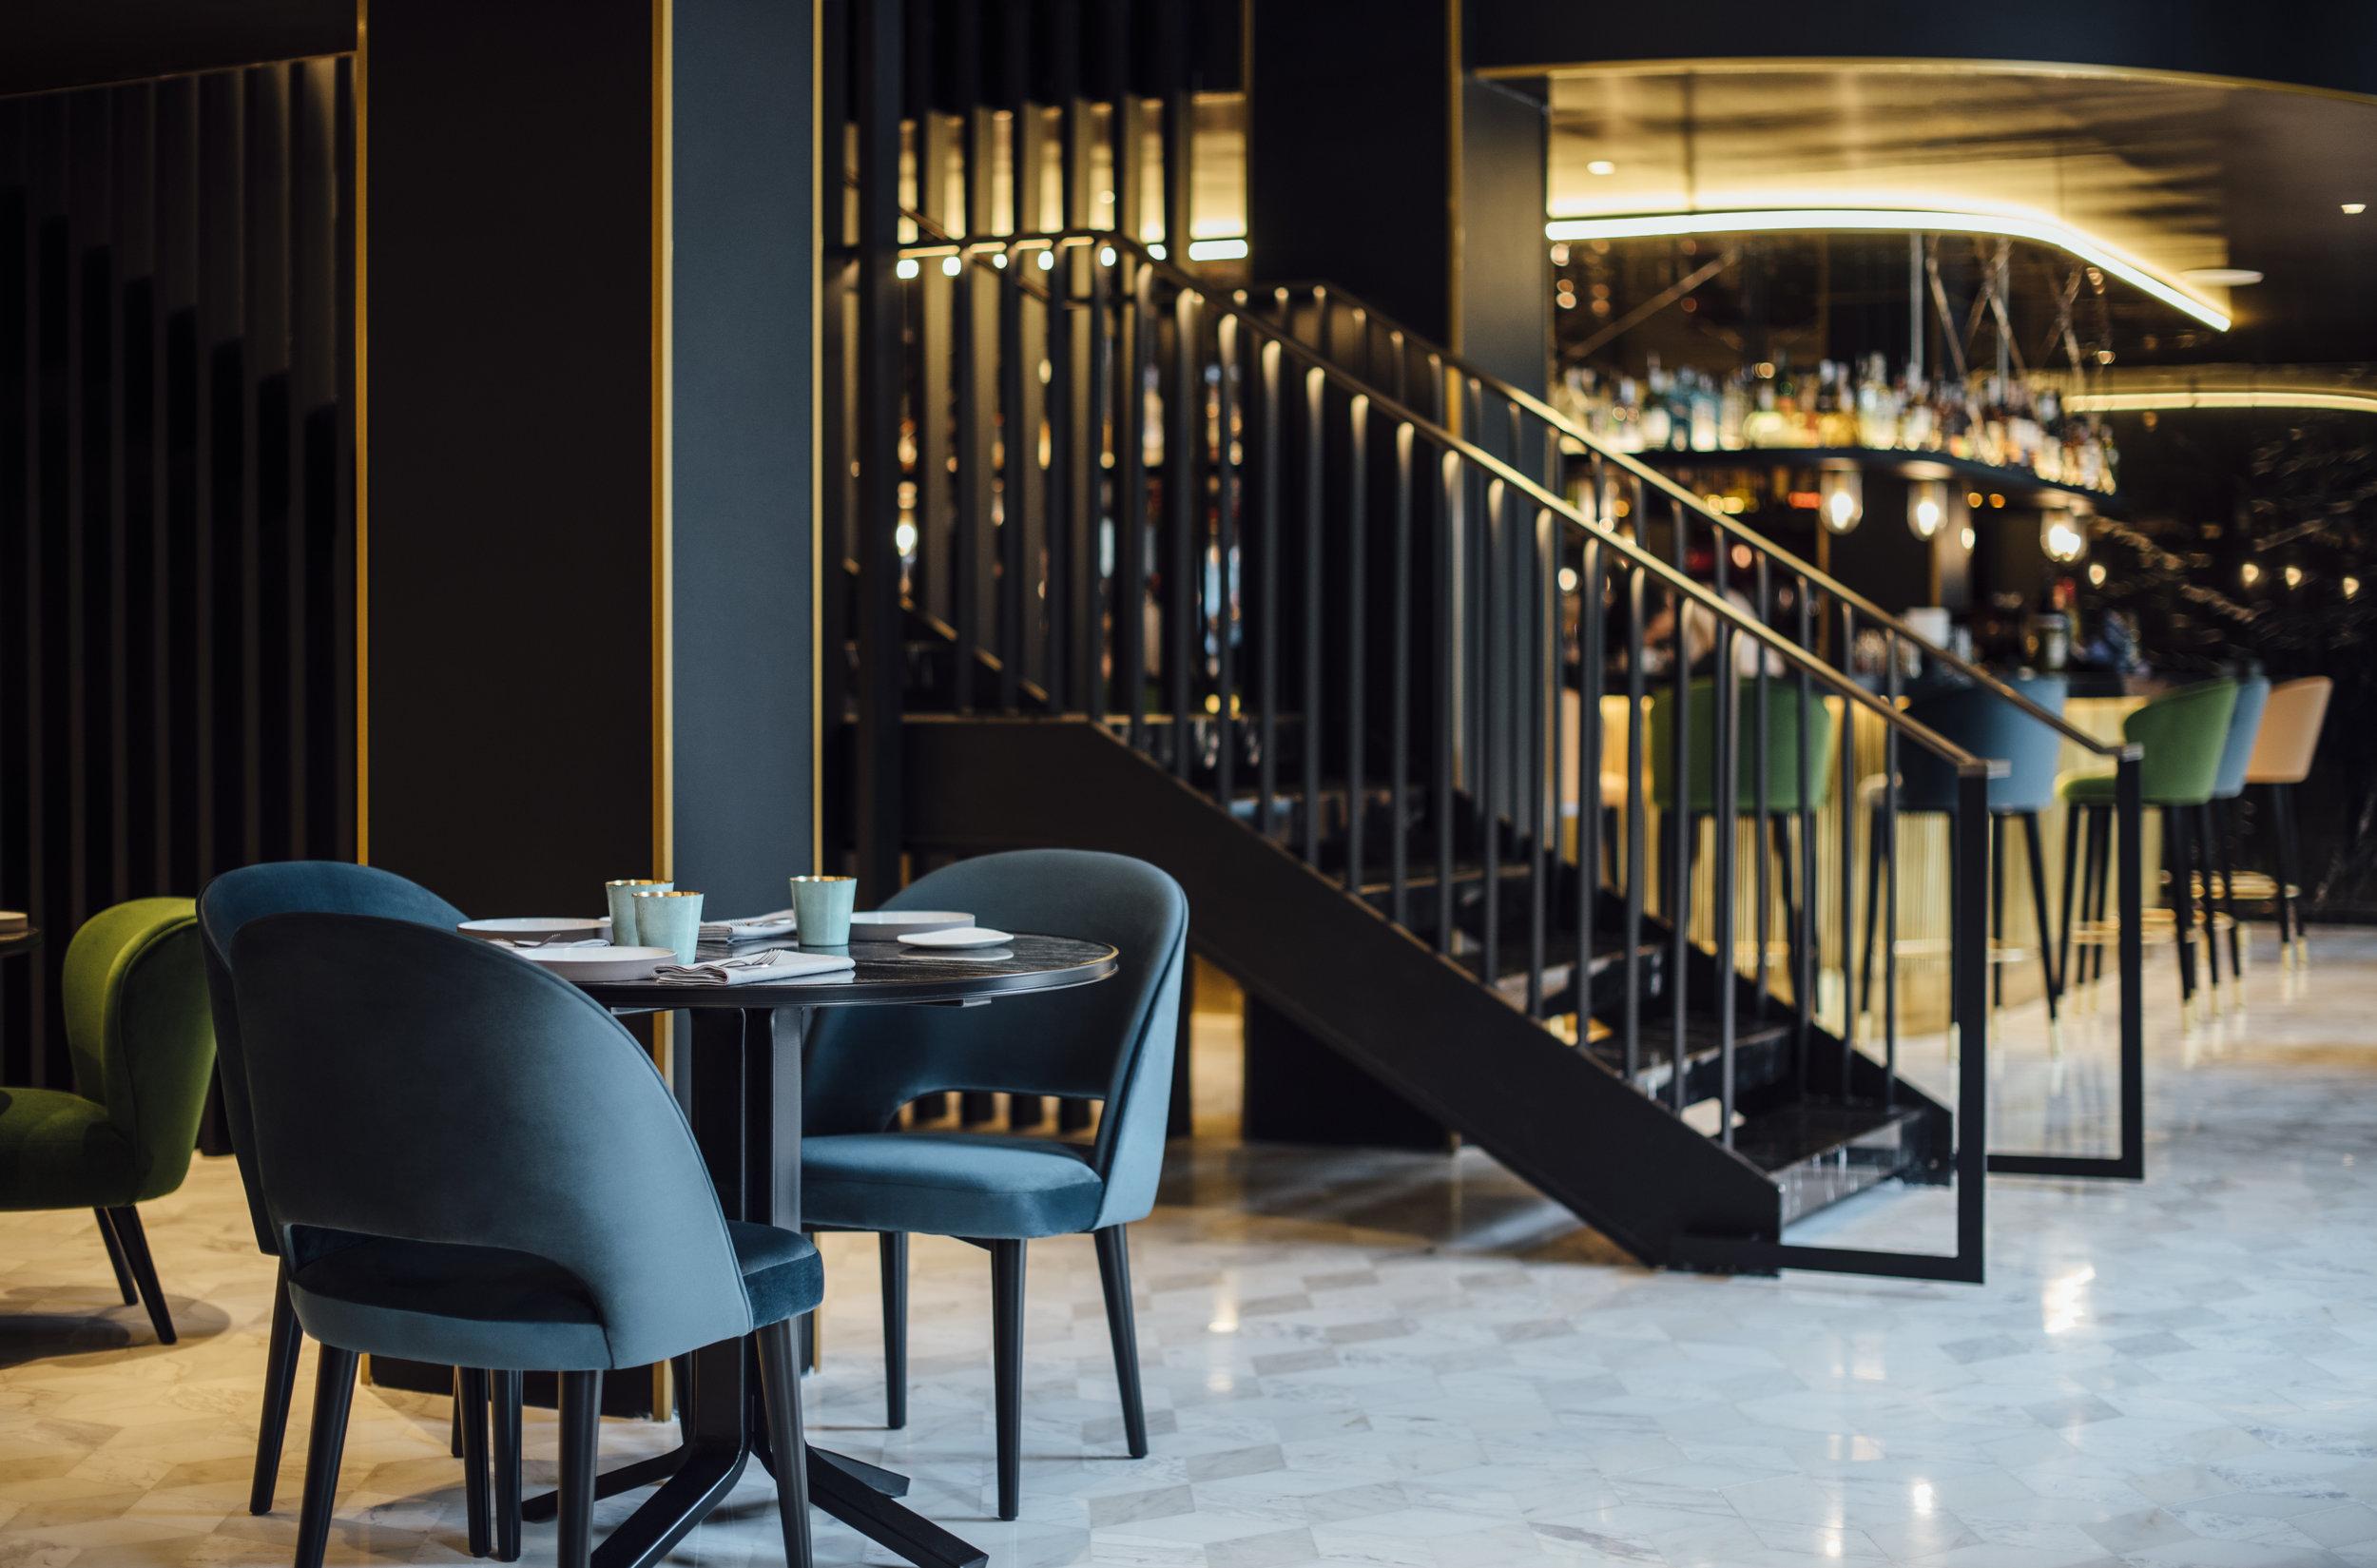 Linia-restaurant-barcelona.jpg